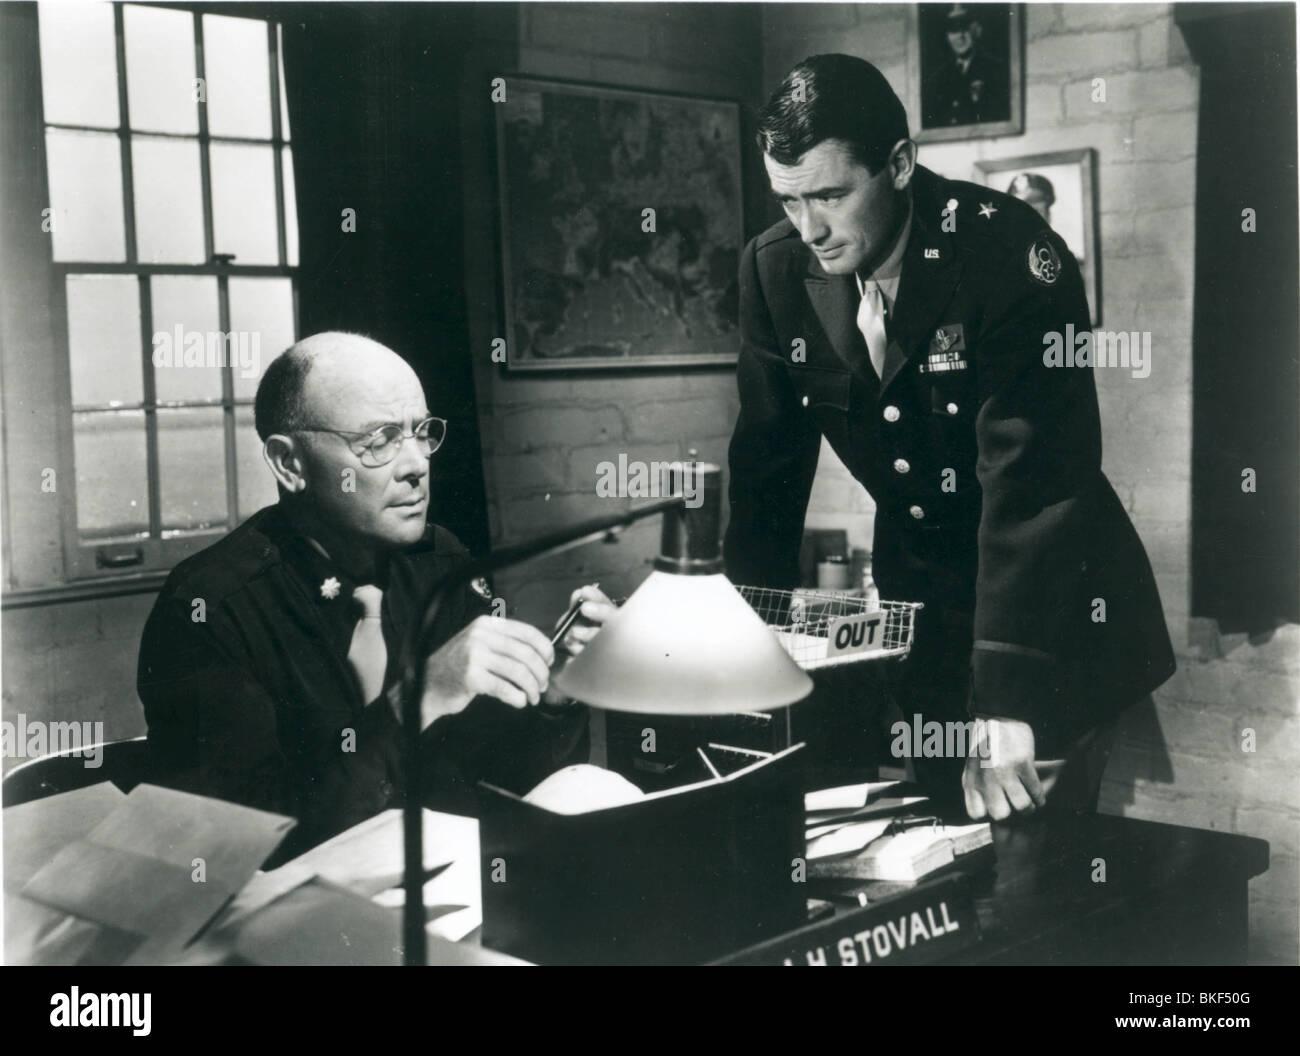 TWELVE O'CLOCK HIGH (1949) DEAN JAGGER, GREGORY PECK TWOH 003P - Stock Image